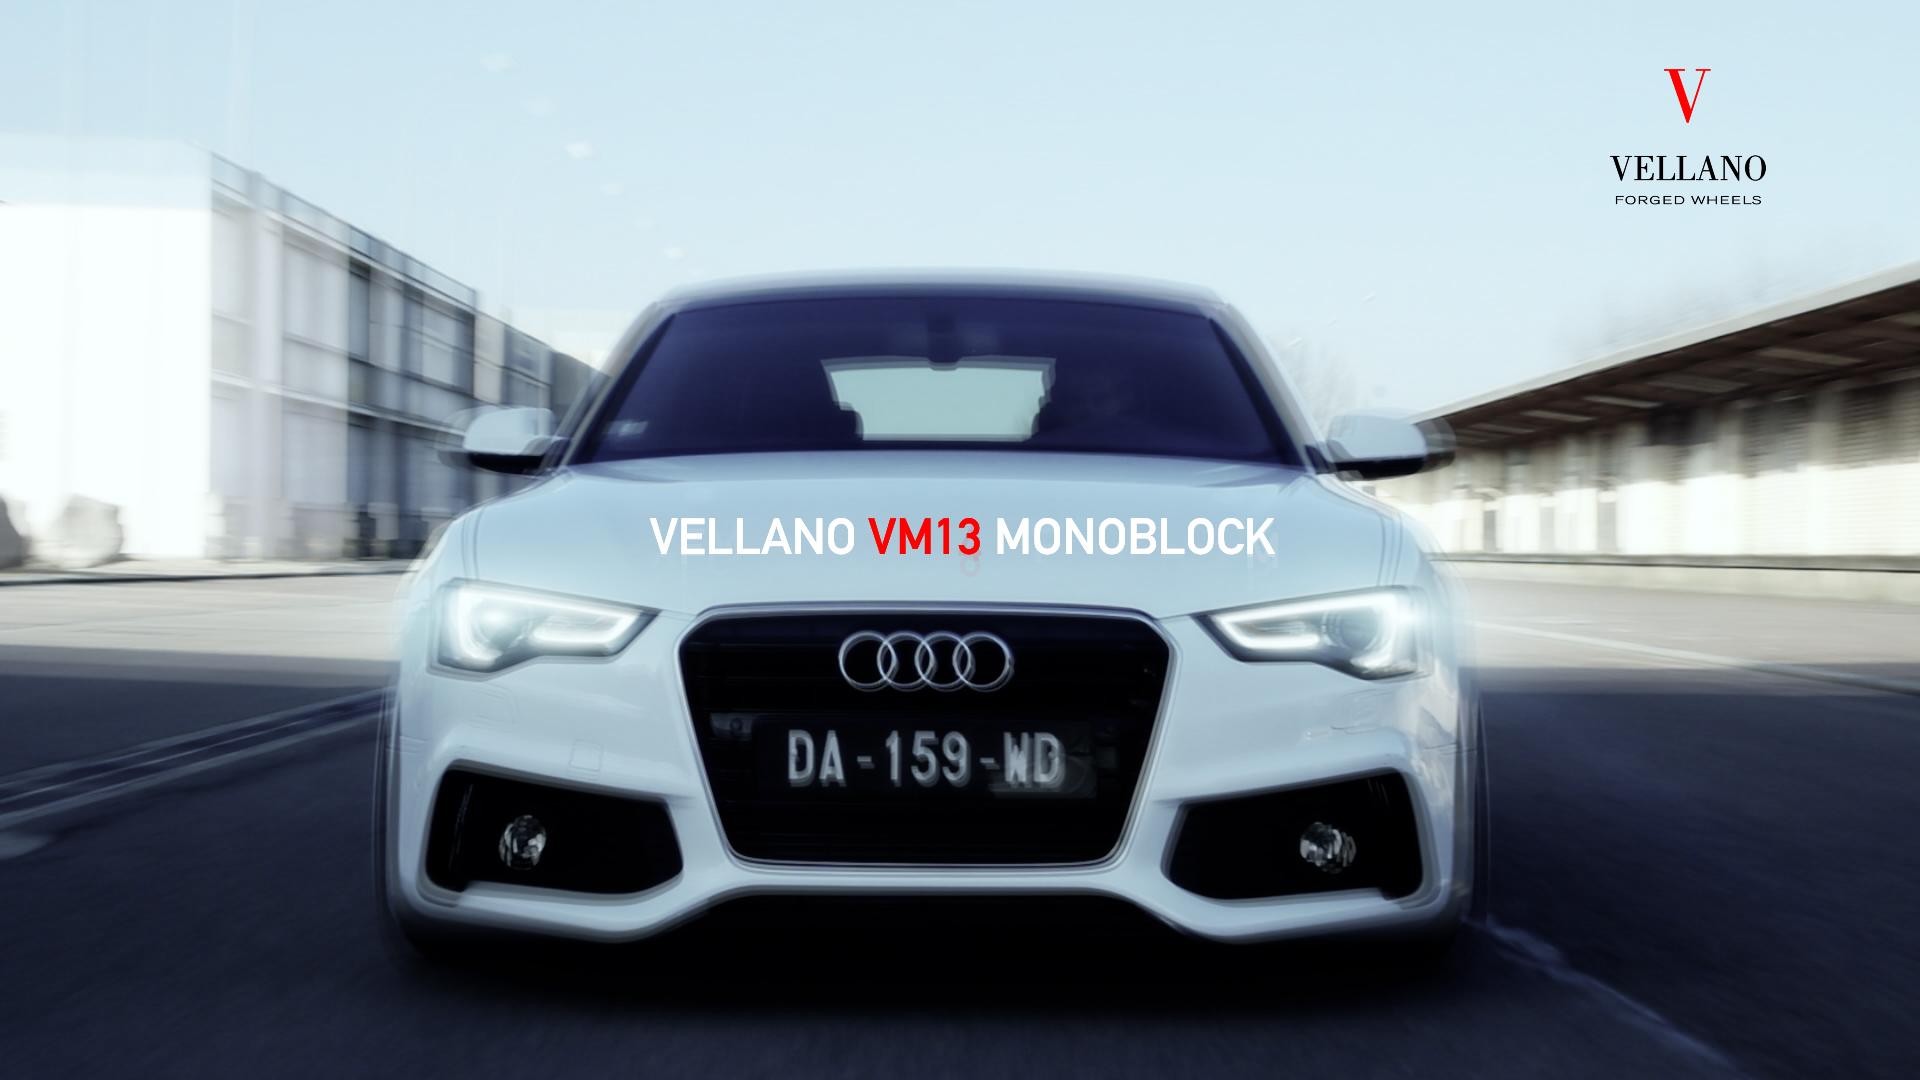 AUDI A5 ON VM13 MONOBLOCK